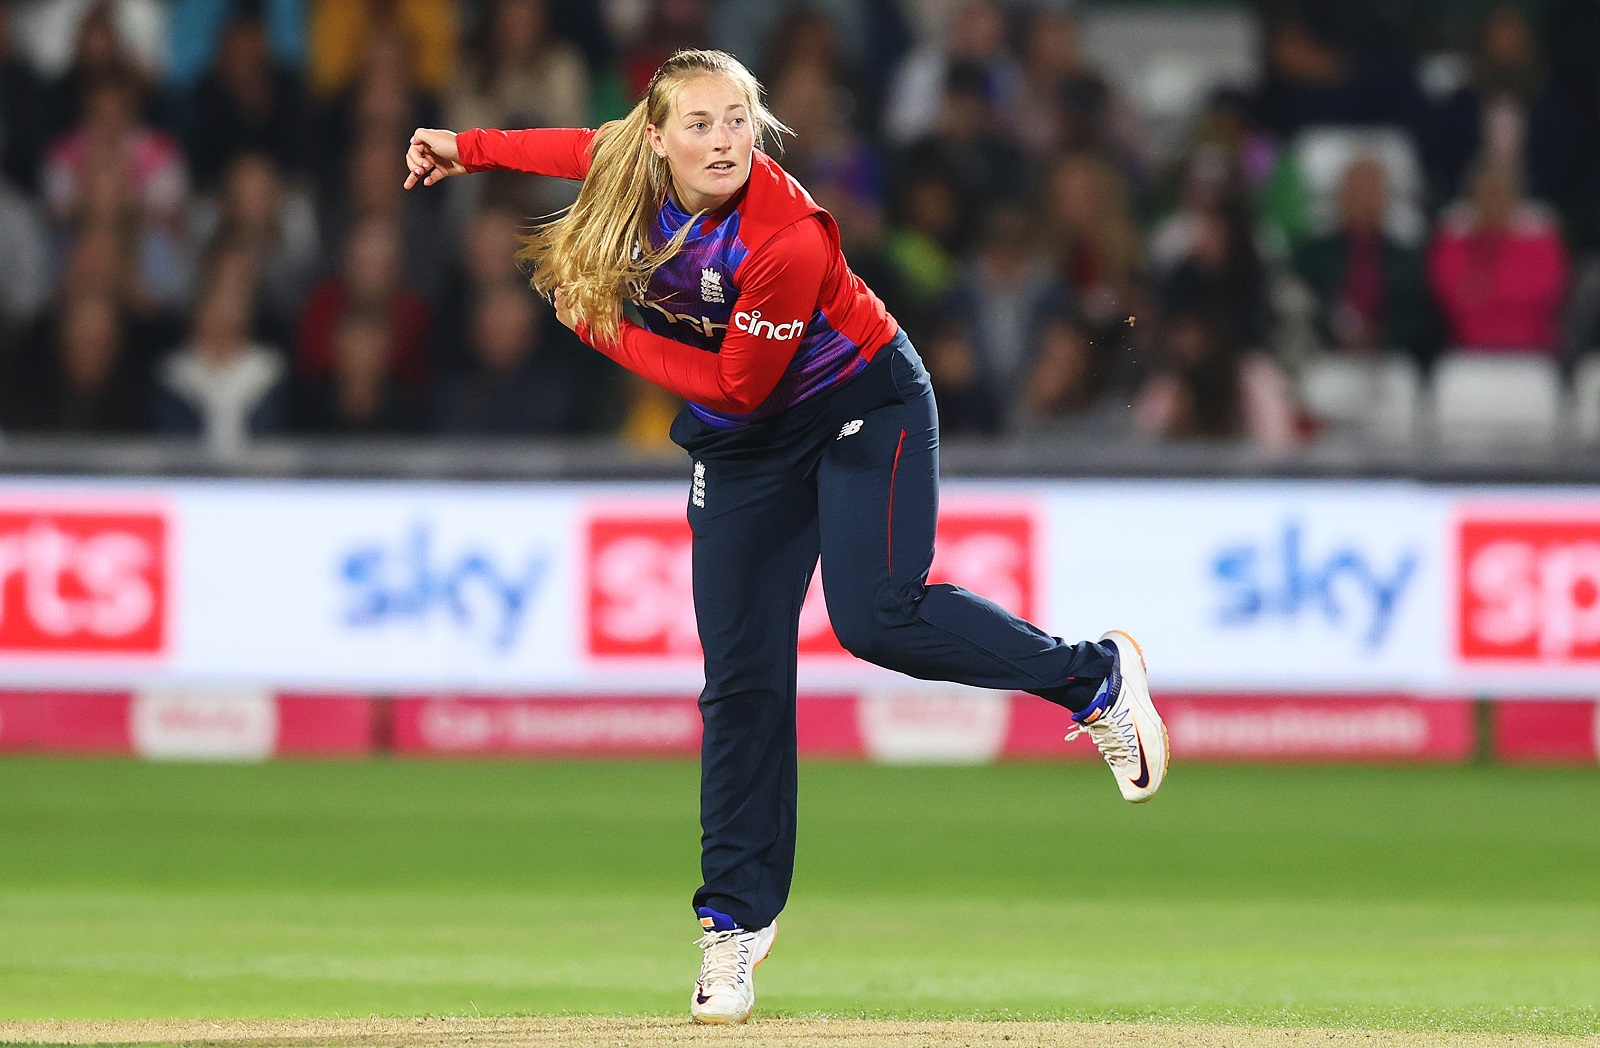 Ecclestone Climbs To T20 World No.9